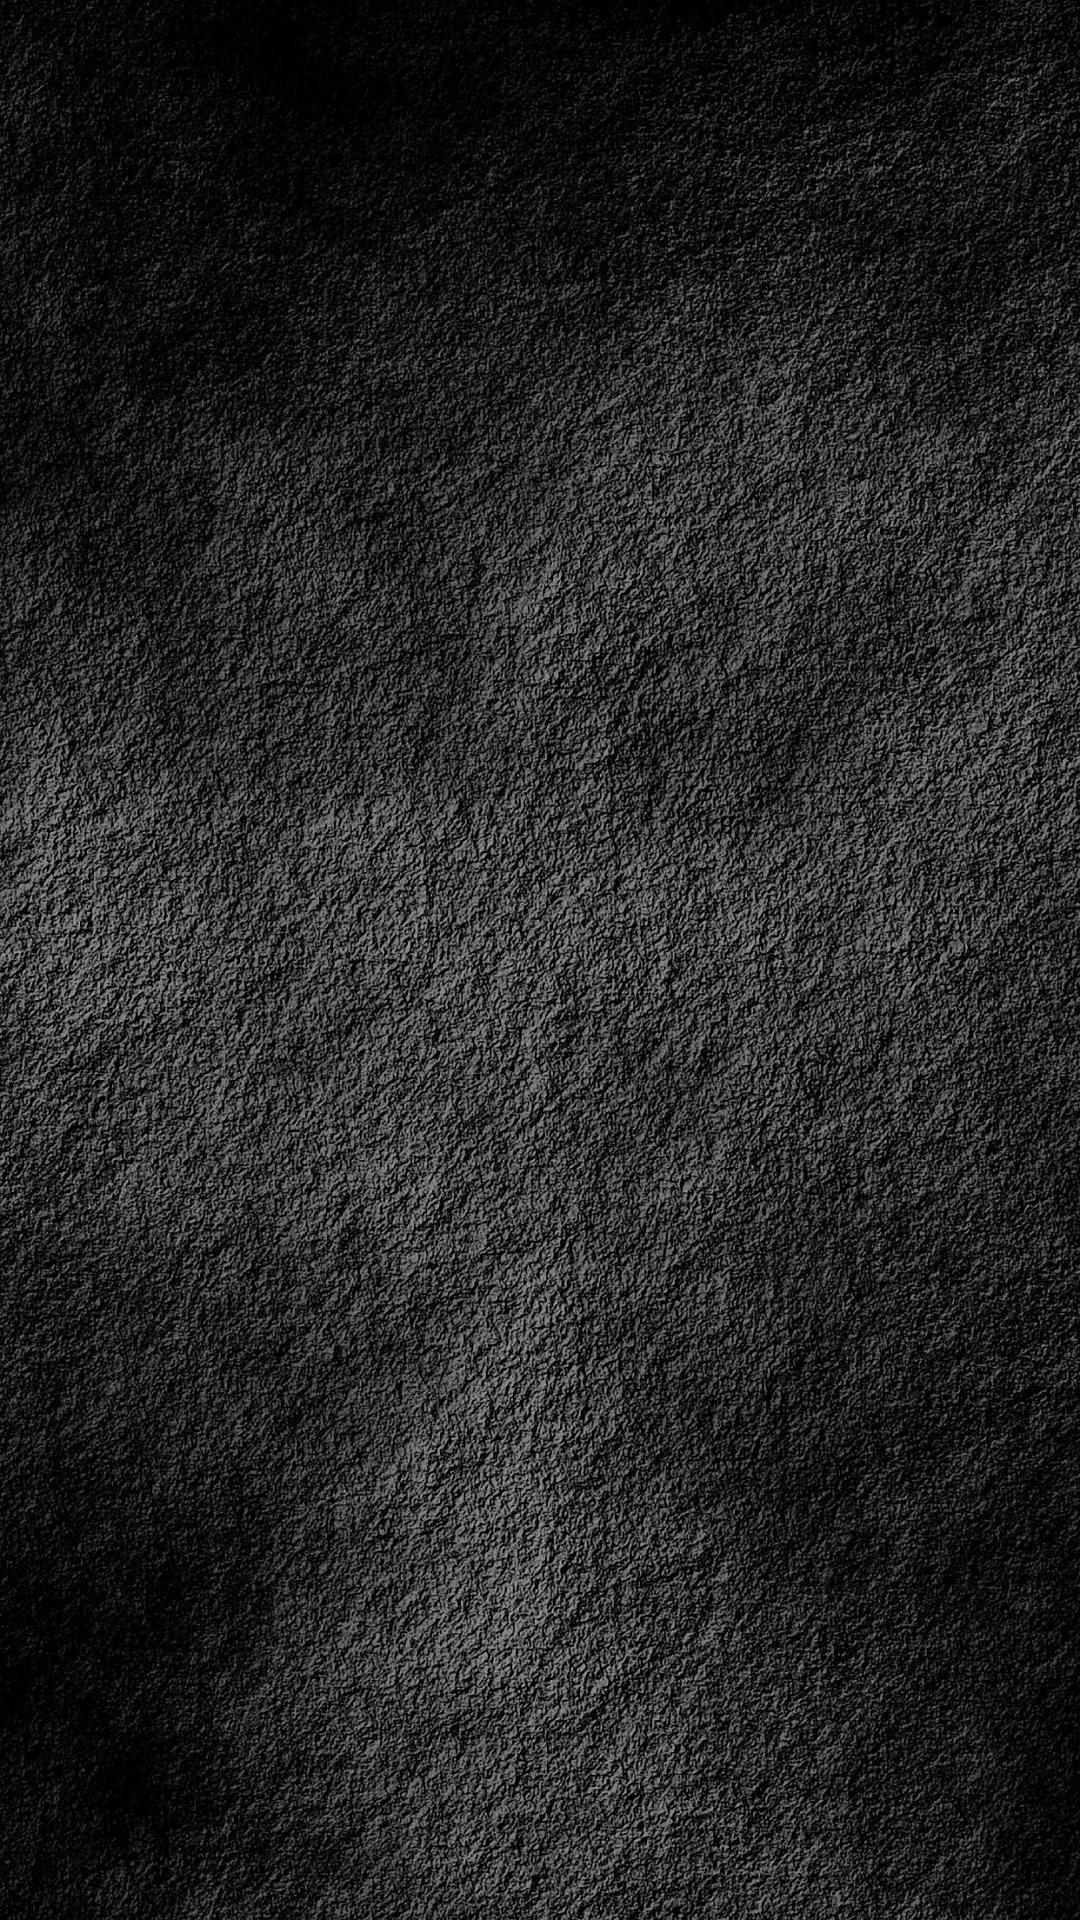 Dark Abstract Iphone 6 Wallpapers Hd - Dark Grey Wallpaper Iphone - HD Wallpaper